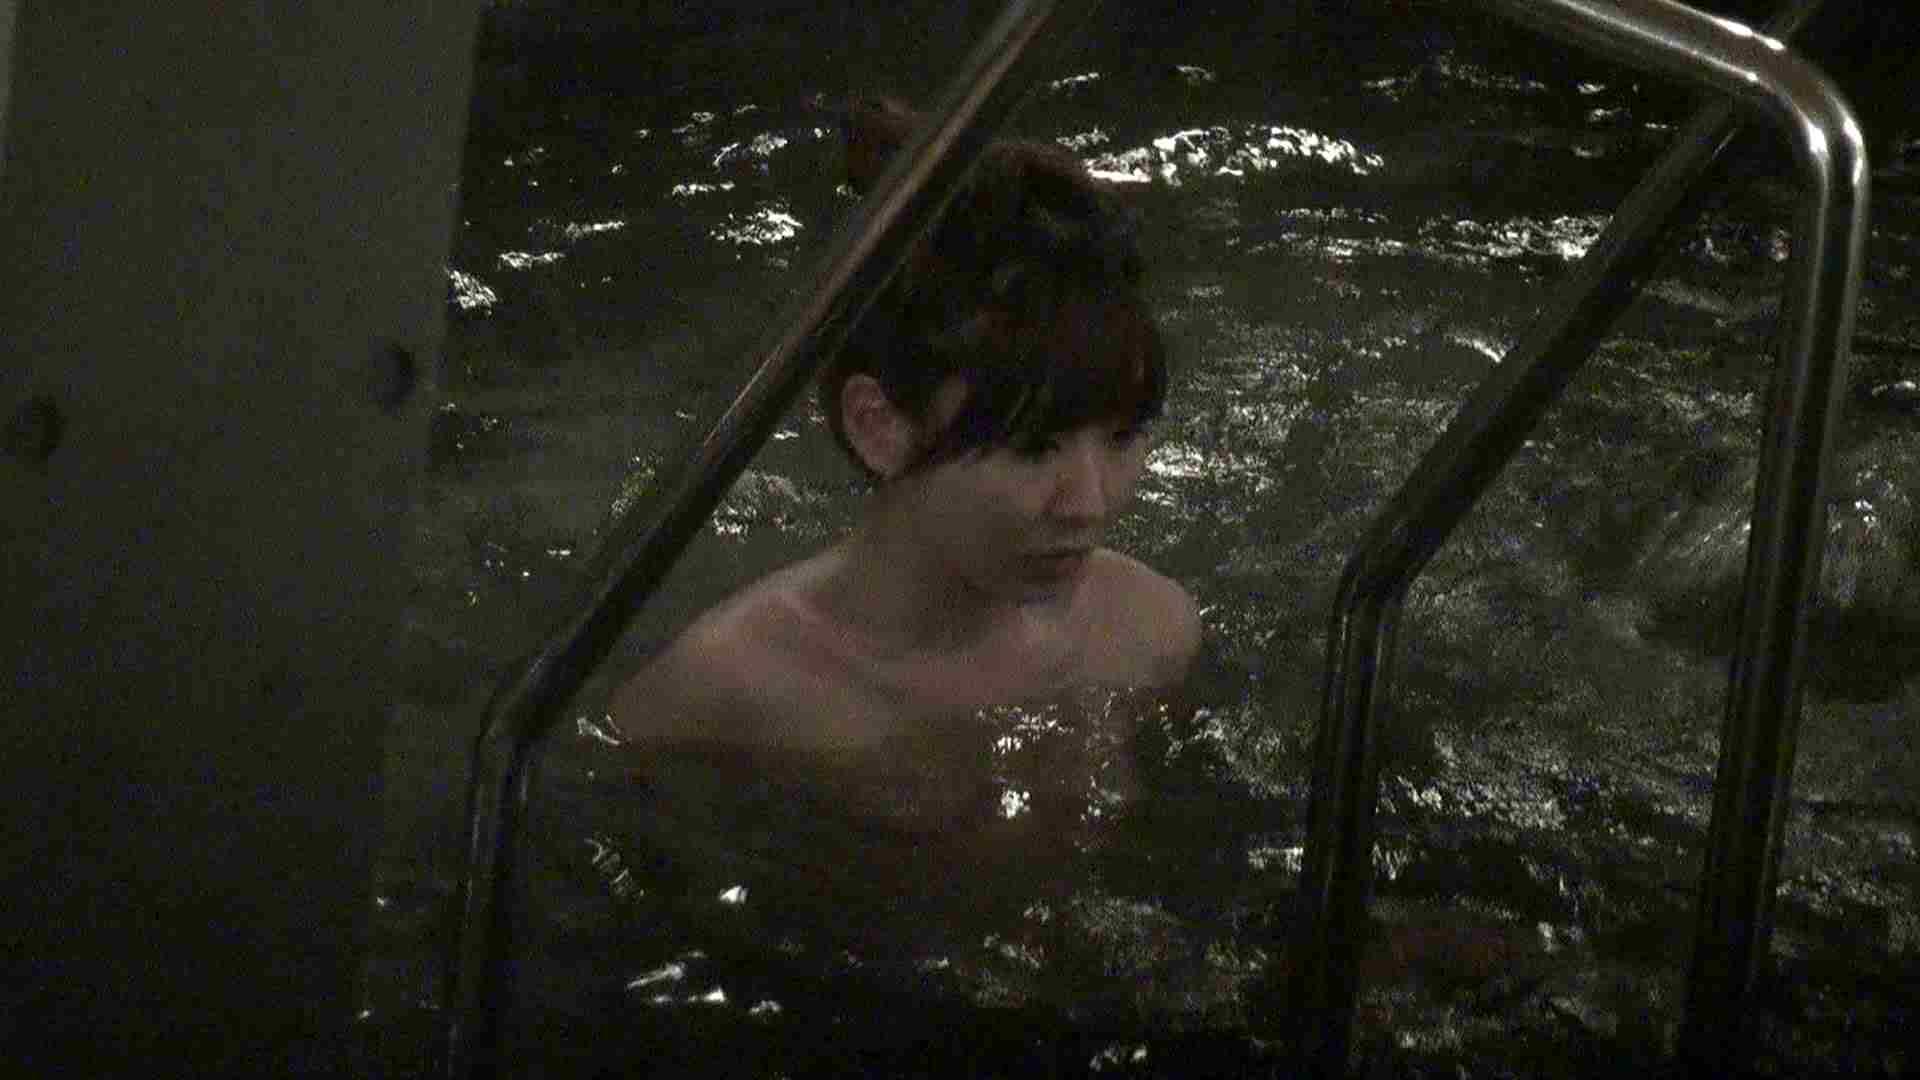 Aquaな露天風呂Vol.410 露天 | 盗撮特撮  11pic 10